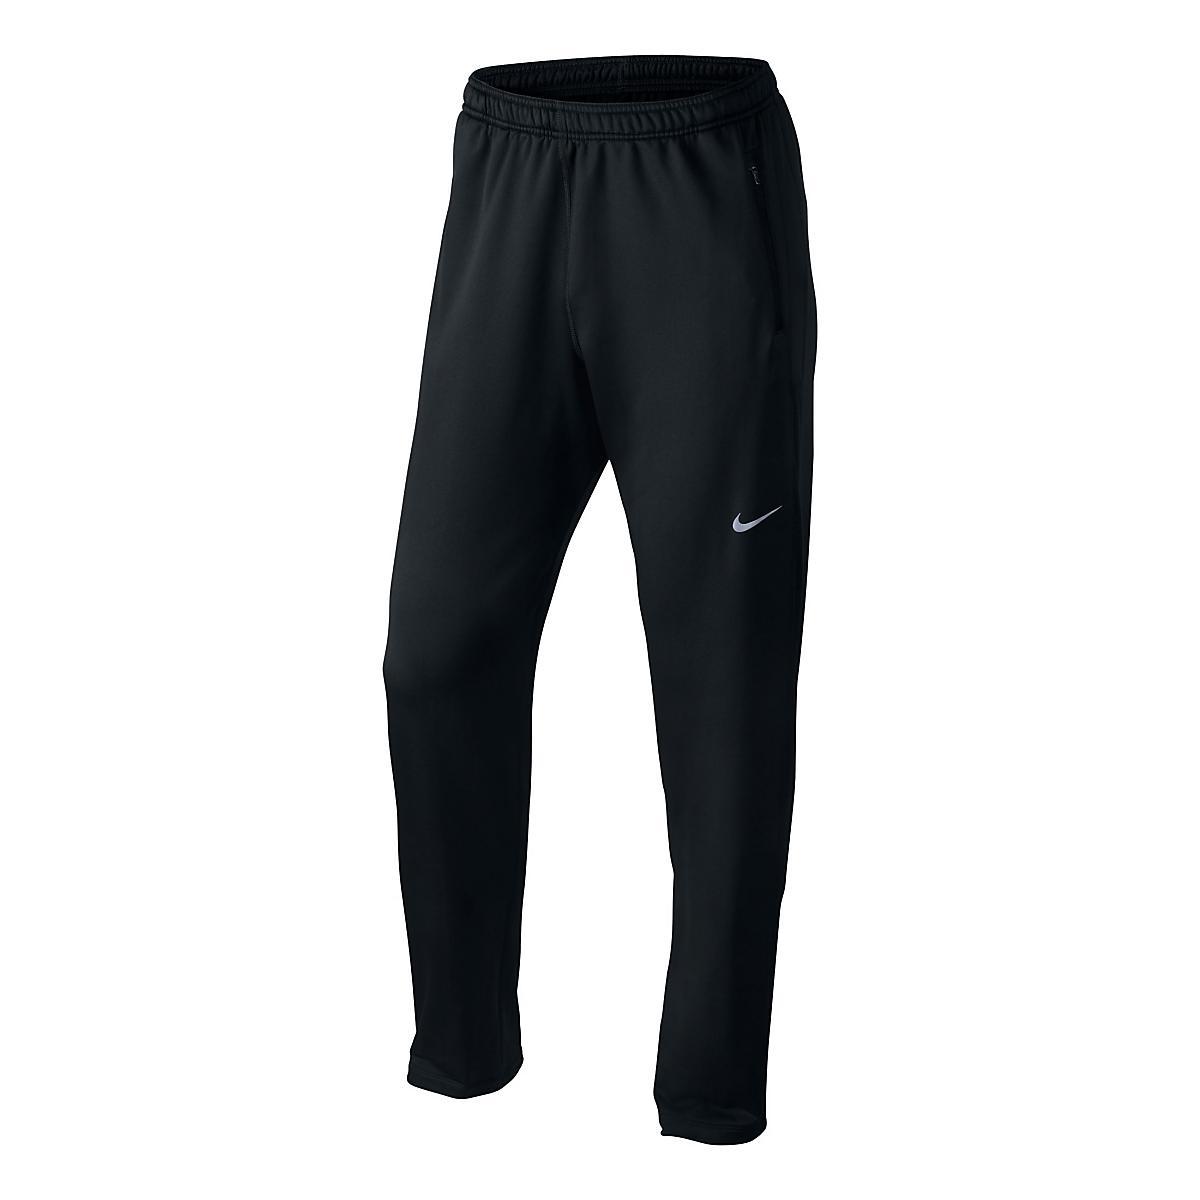 Mens Nike Element Thermal Pant Cold Weather Pants At Road